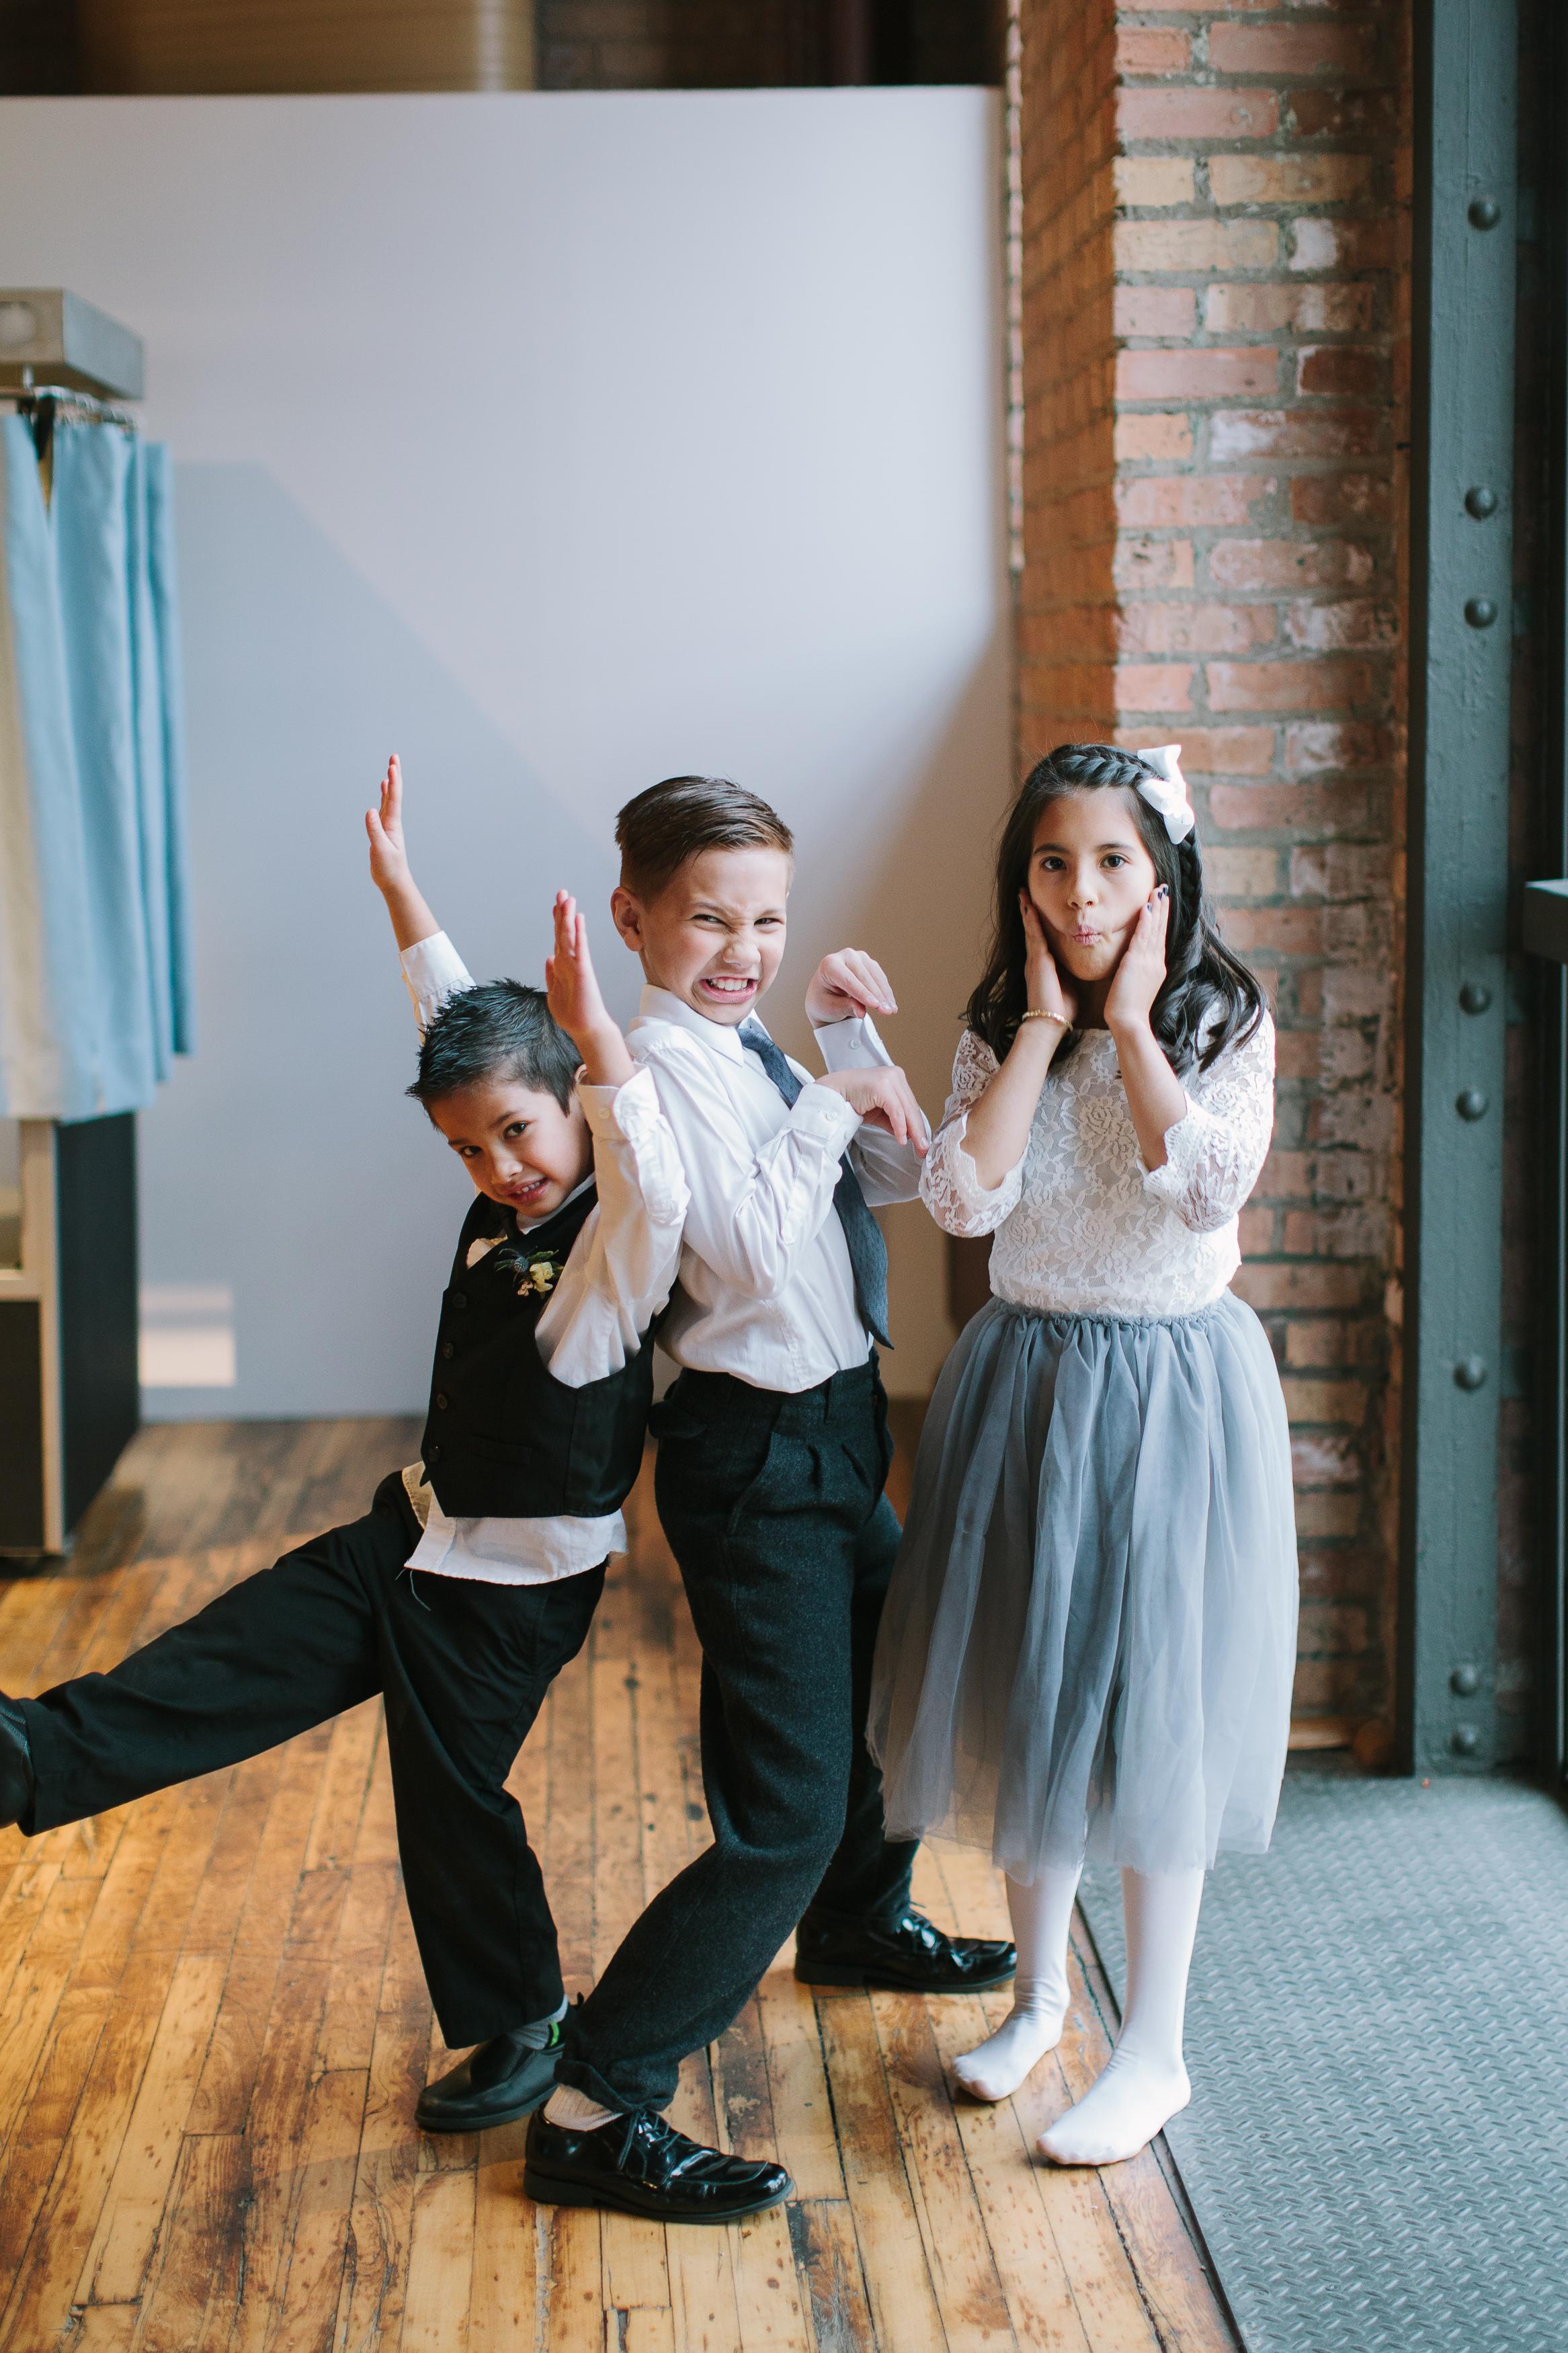 Nicodem Creative_Kerr Wedding_Bridgeport Art Center Chicago-21.jpg